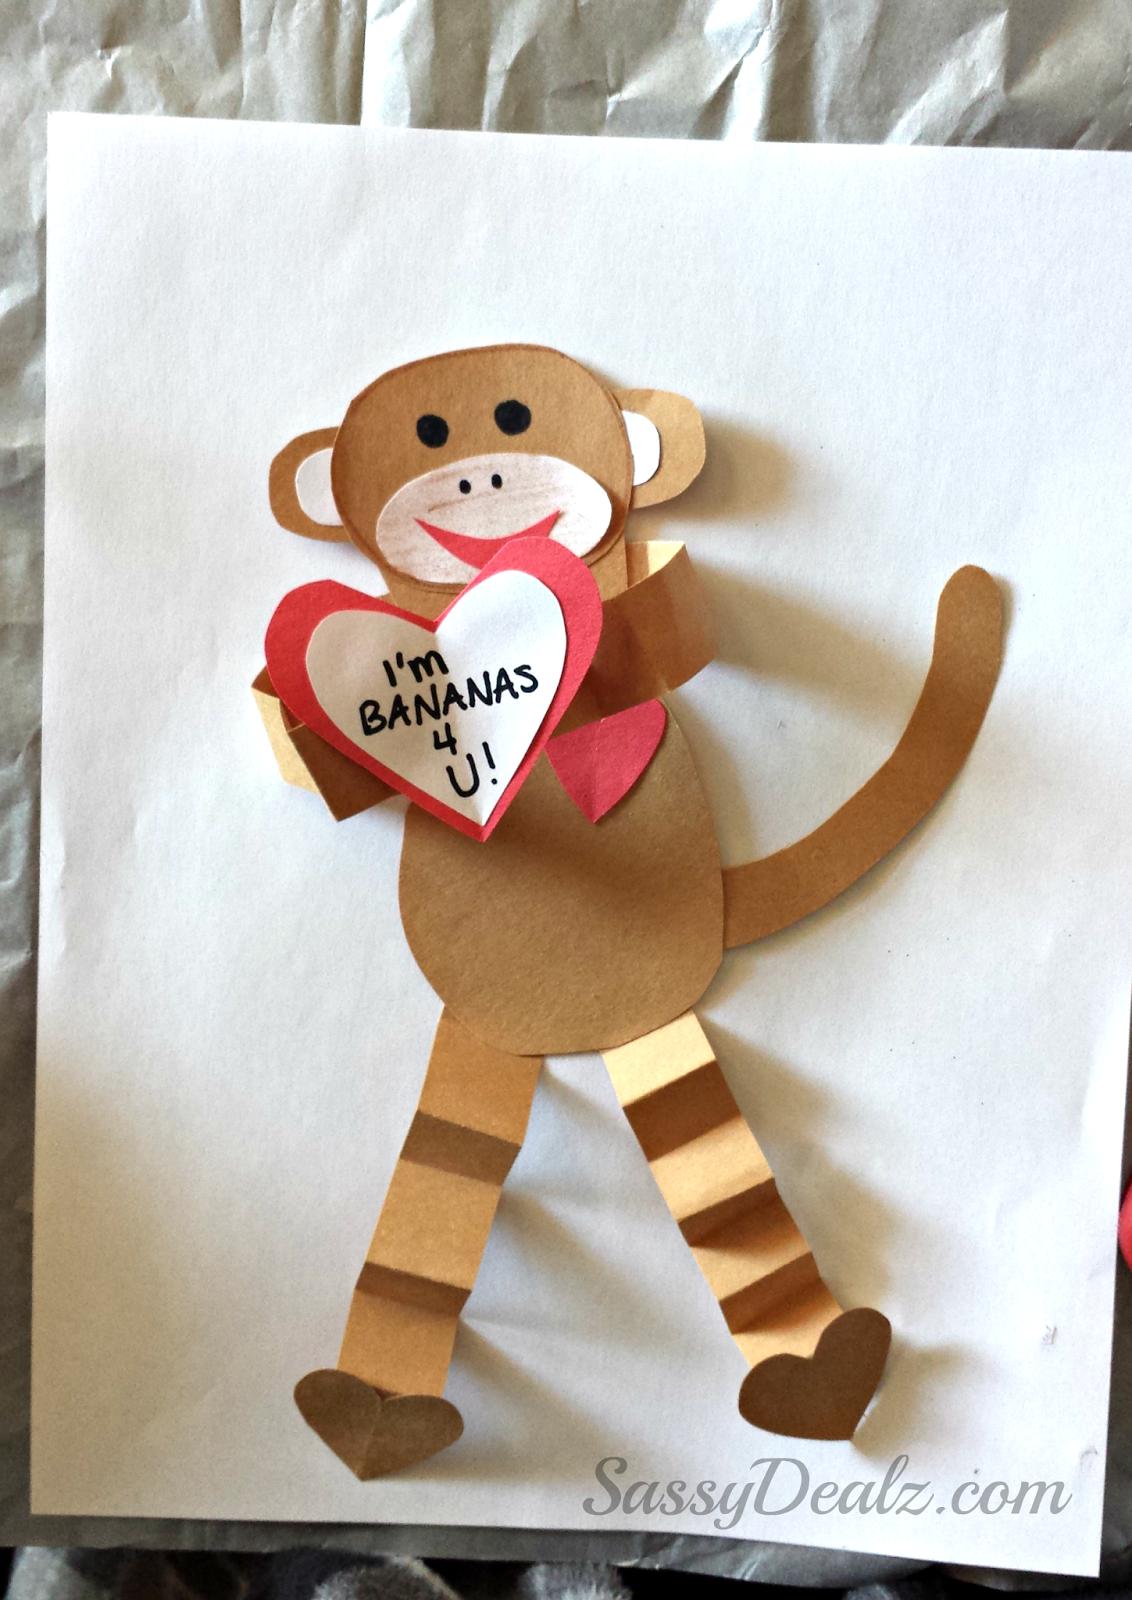 Preschool craft ideas for valentines day - Valentine S Day Heart Monkey Craft For Kids